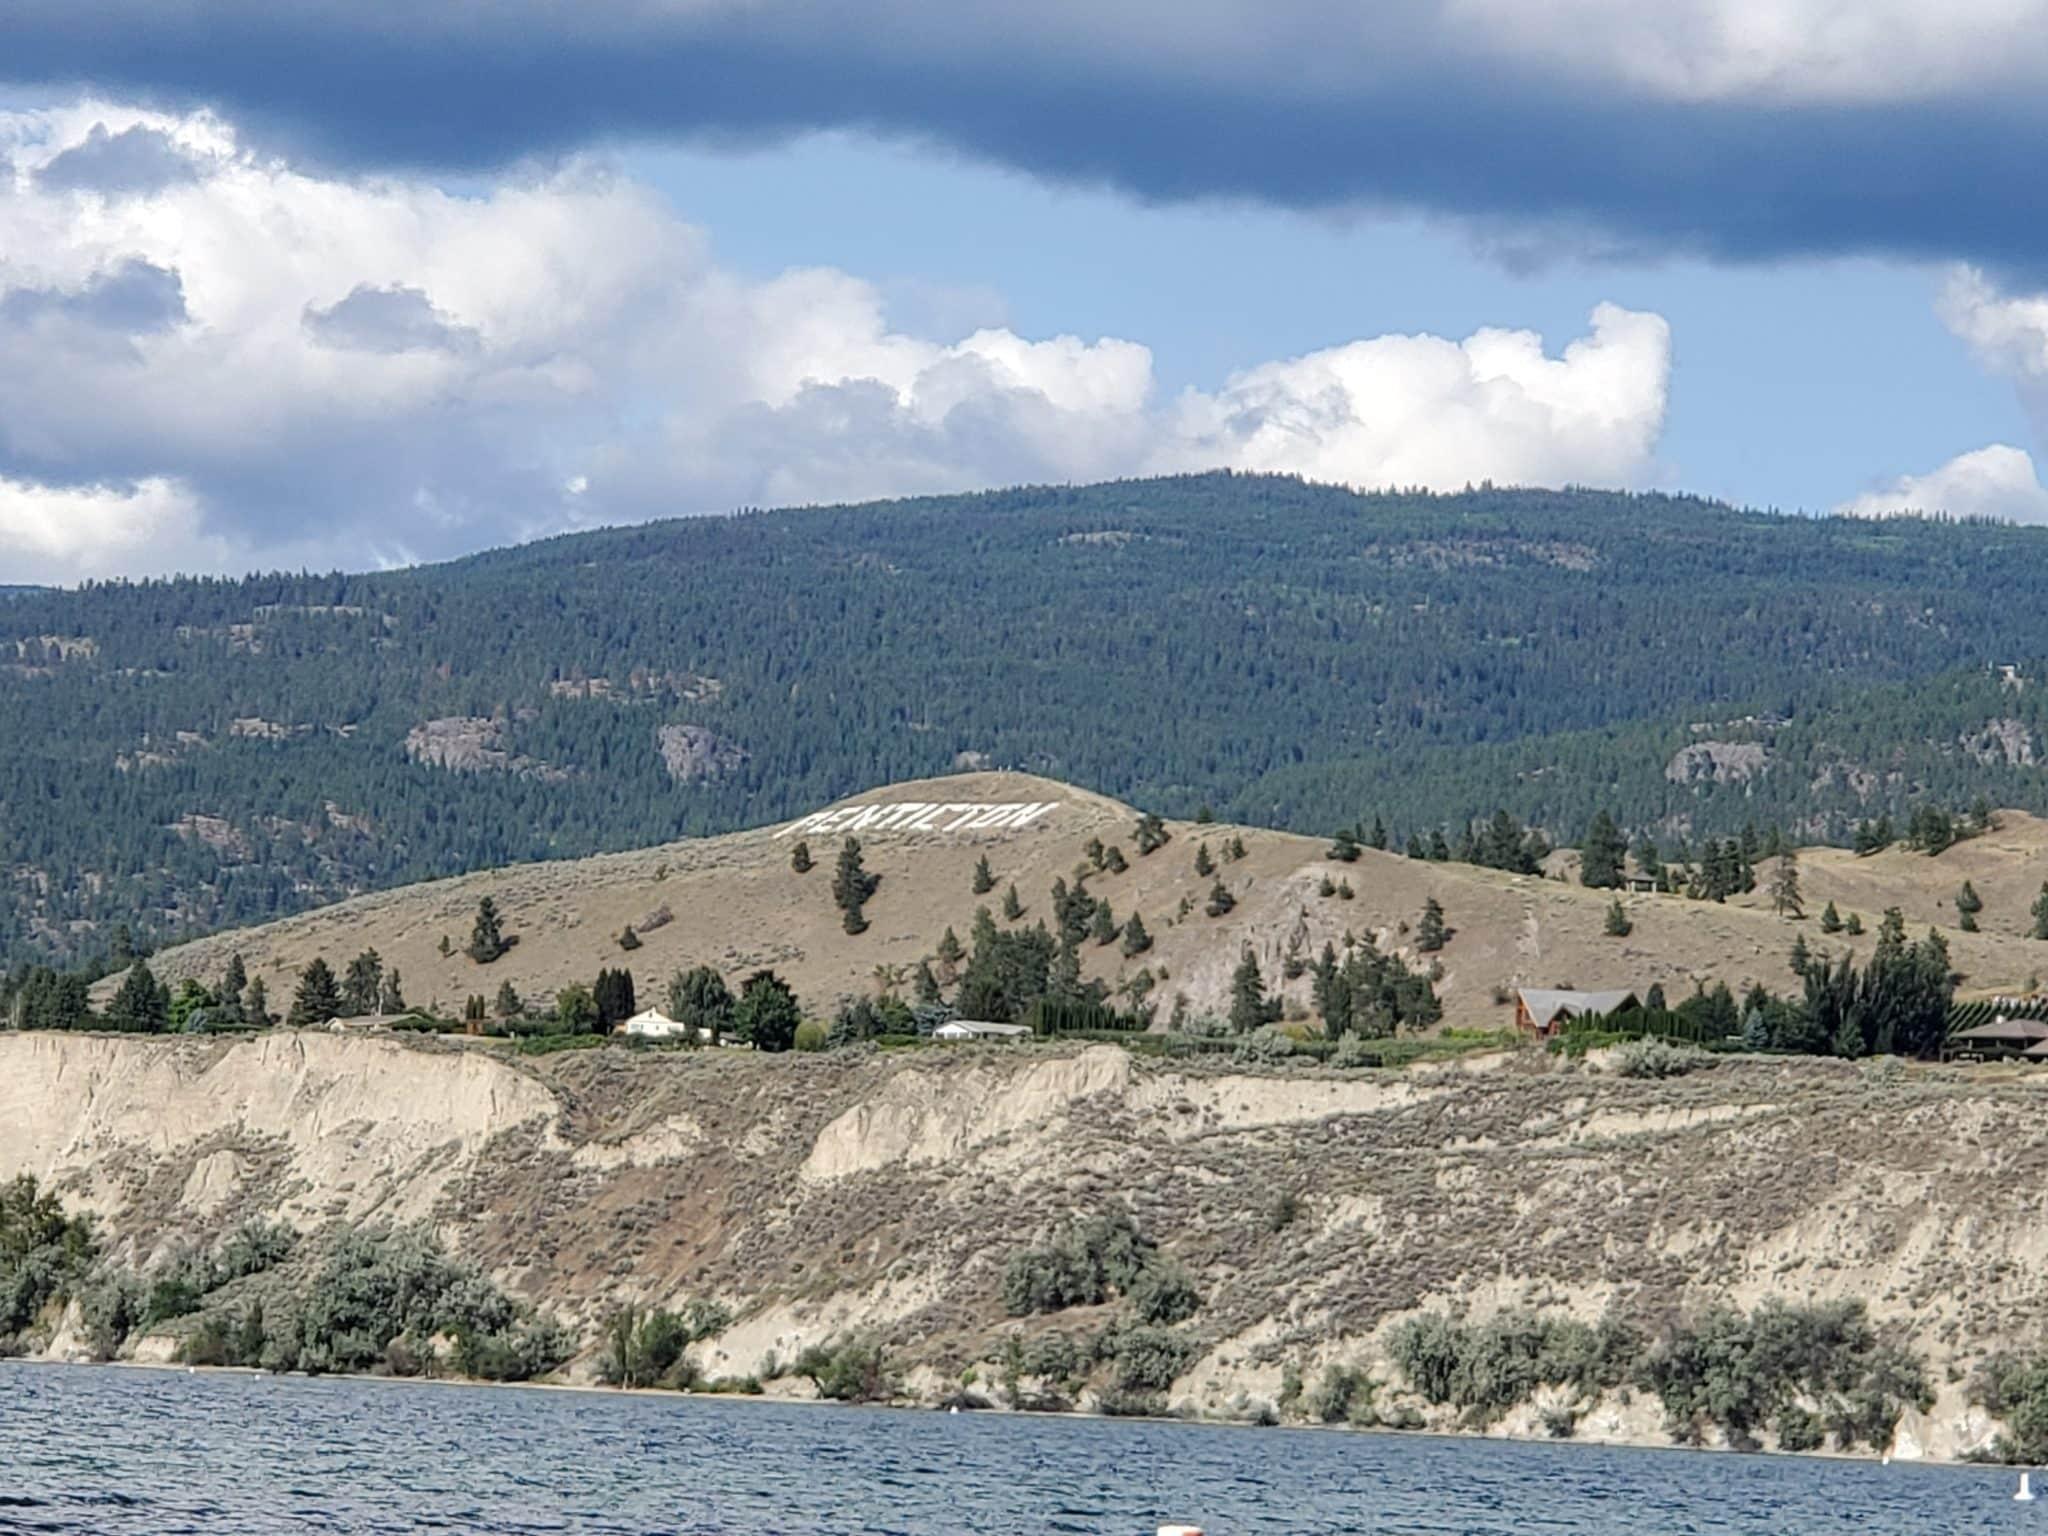 Okanagan Lake Off-Leash Dog Park – Penticton – BC (6)